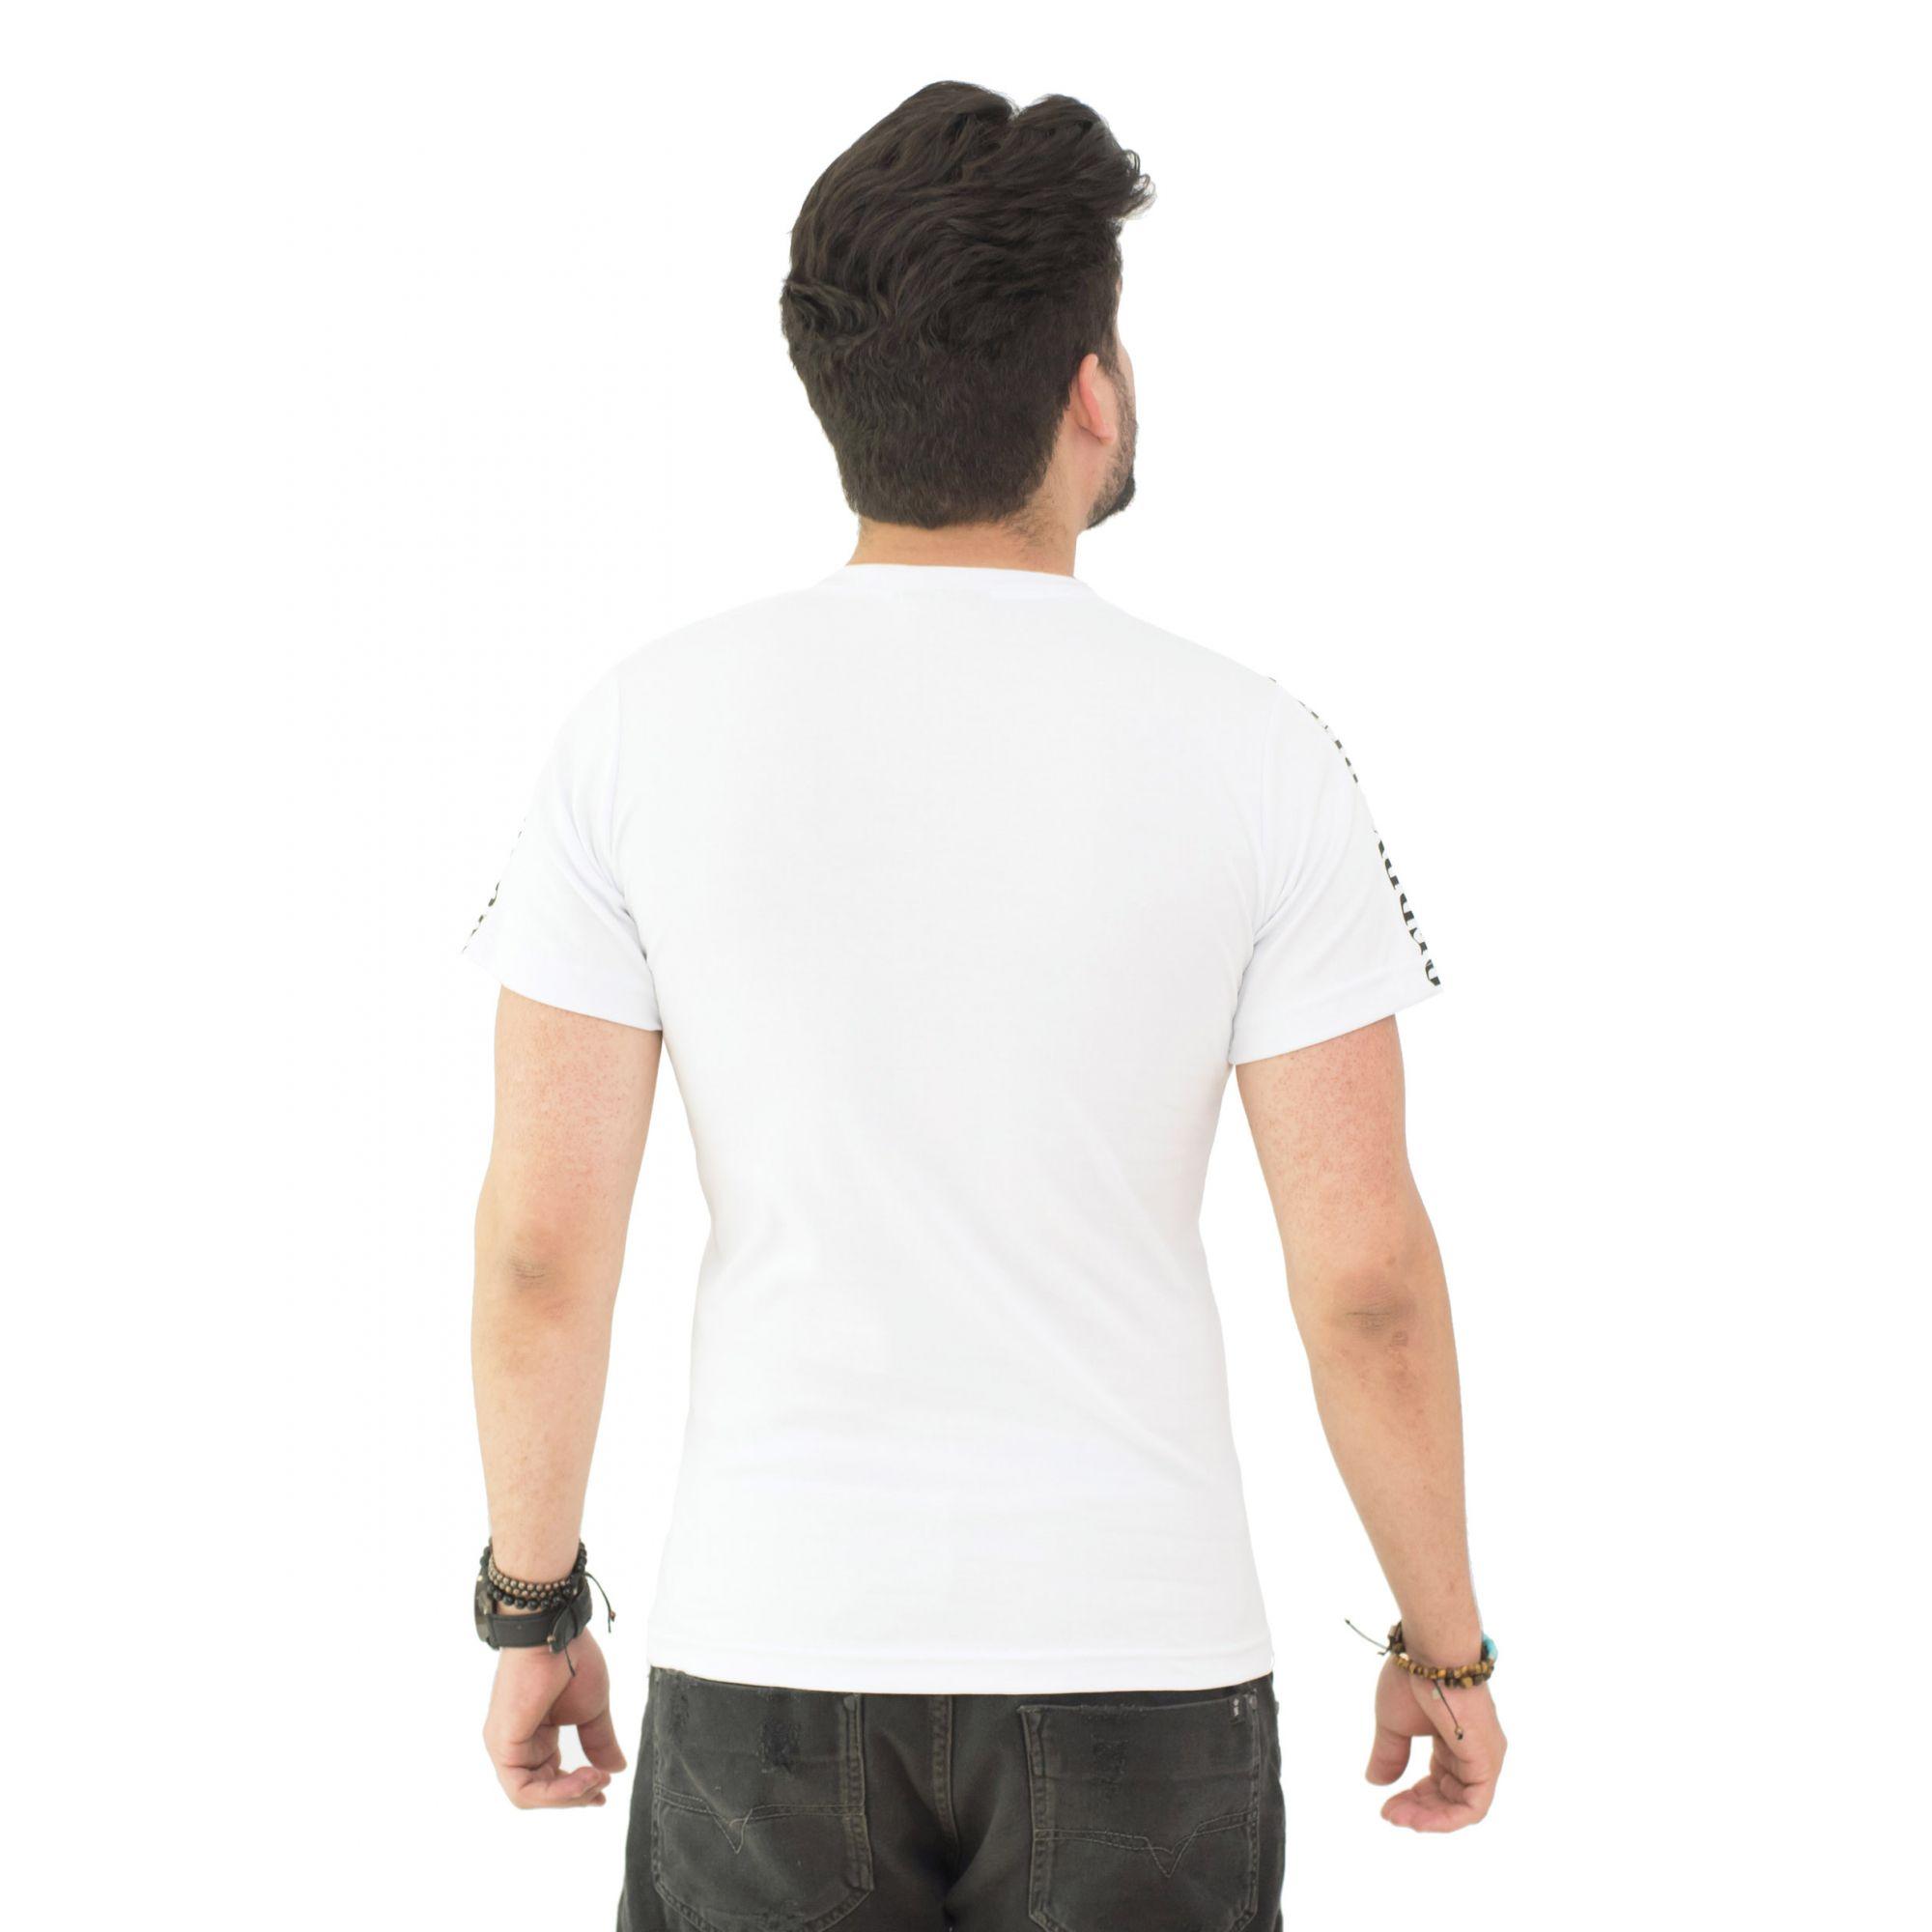 Camiseta Brb-02 Branca SLIM FIT  - Ca Brasileira